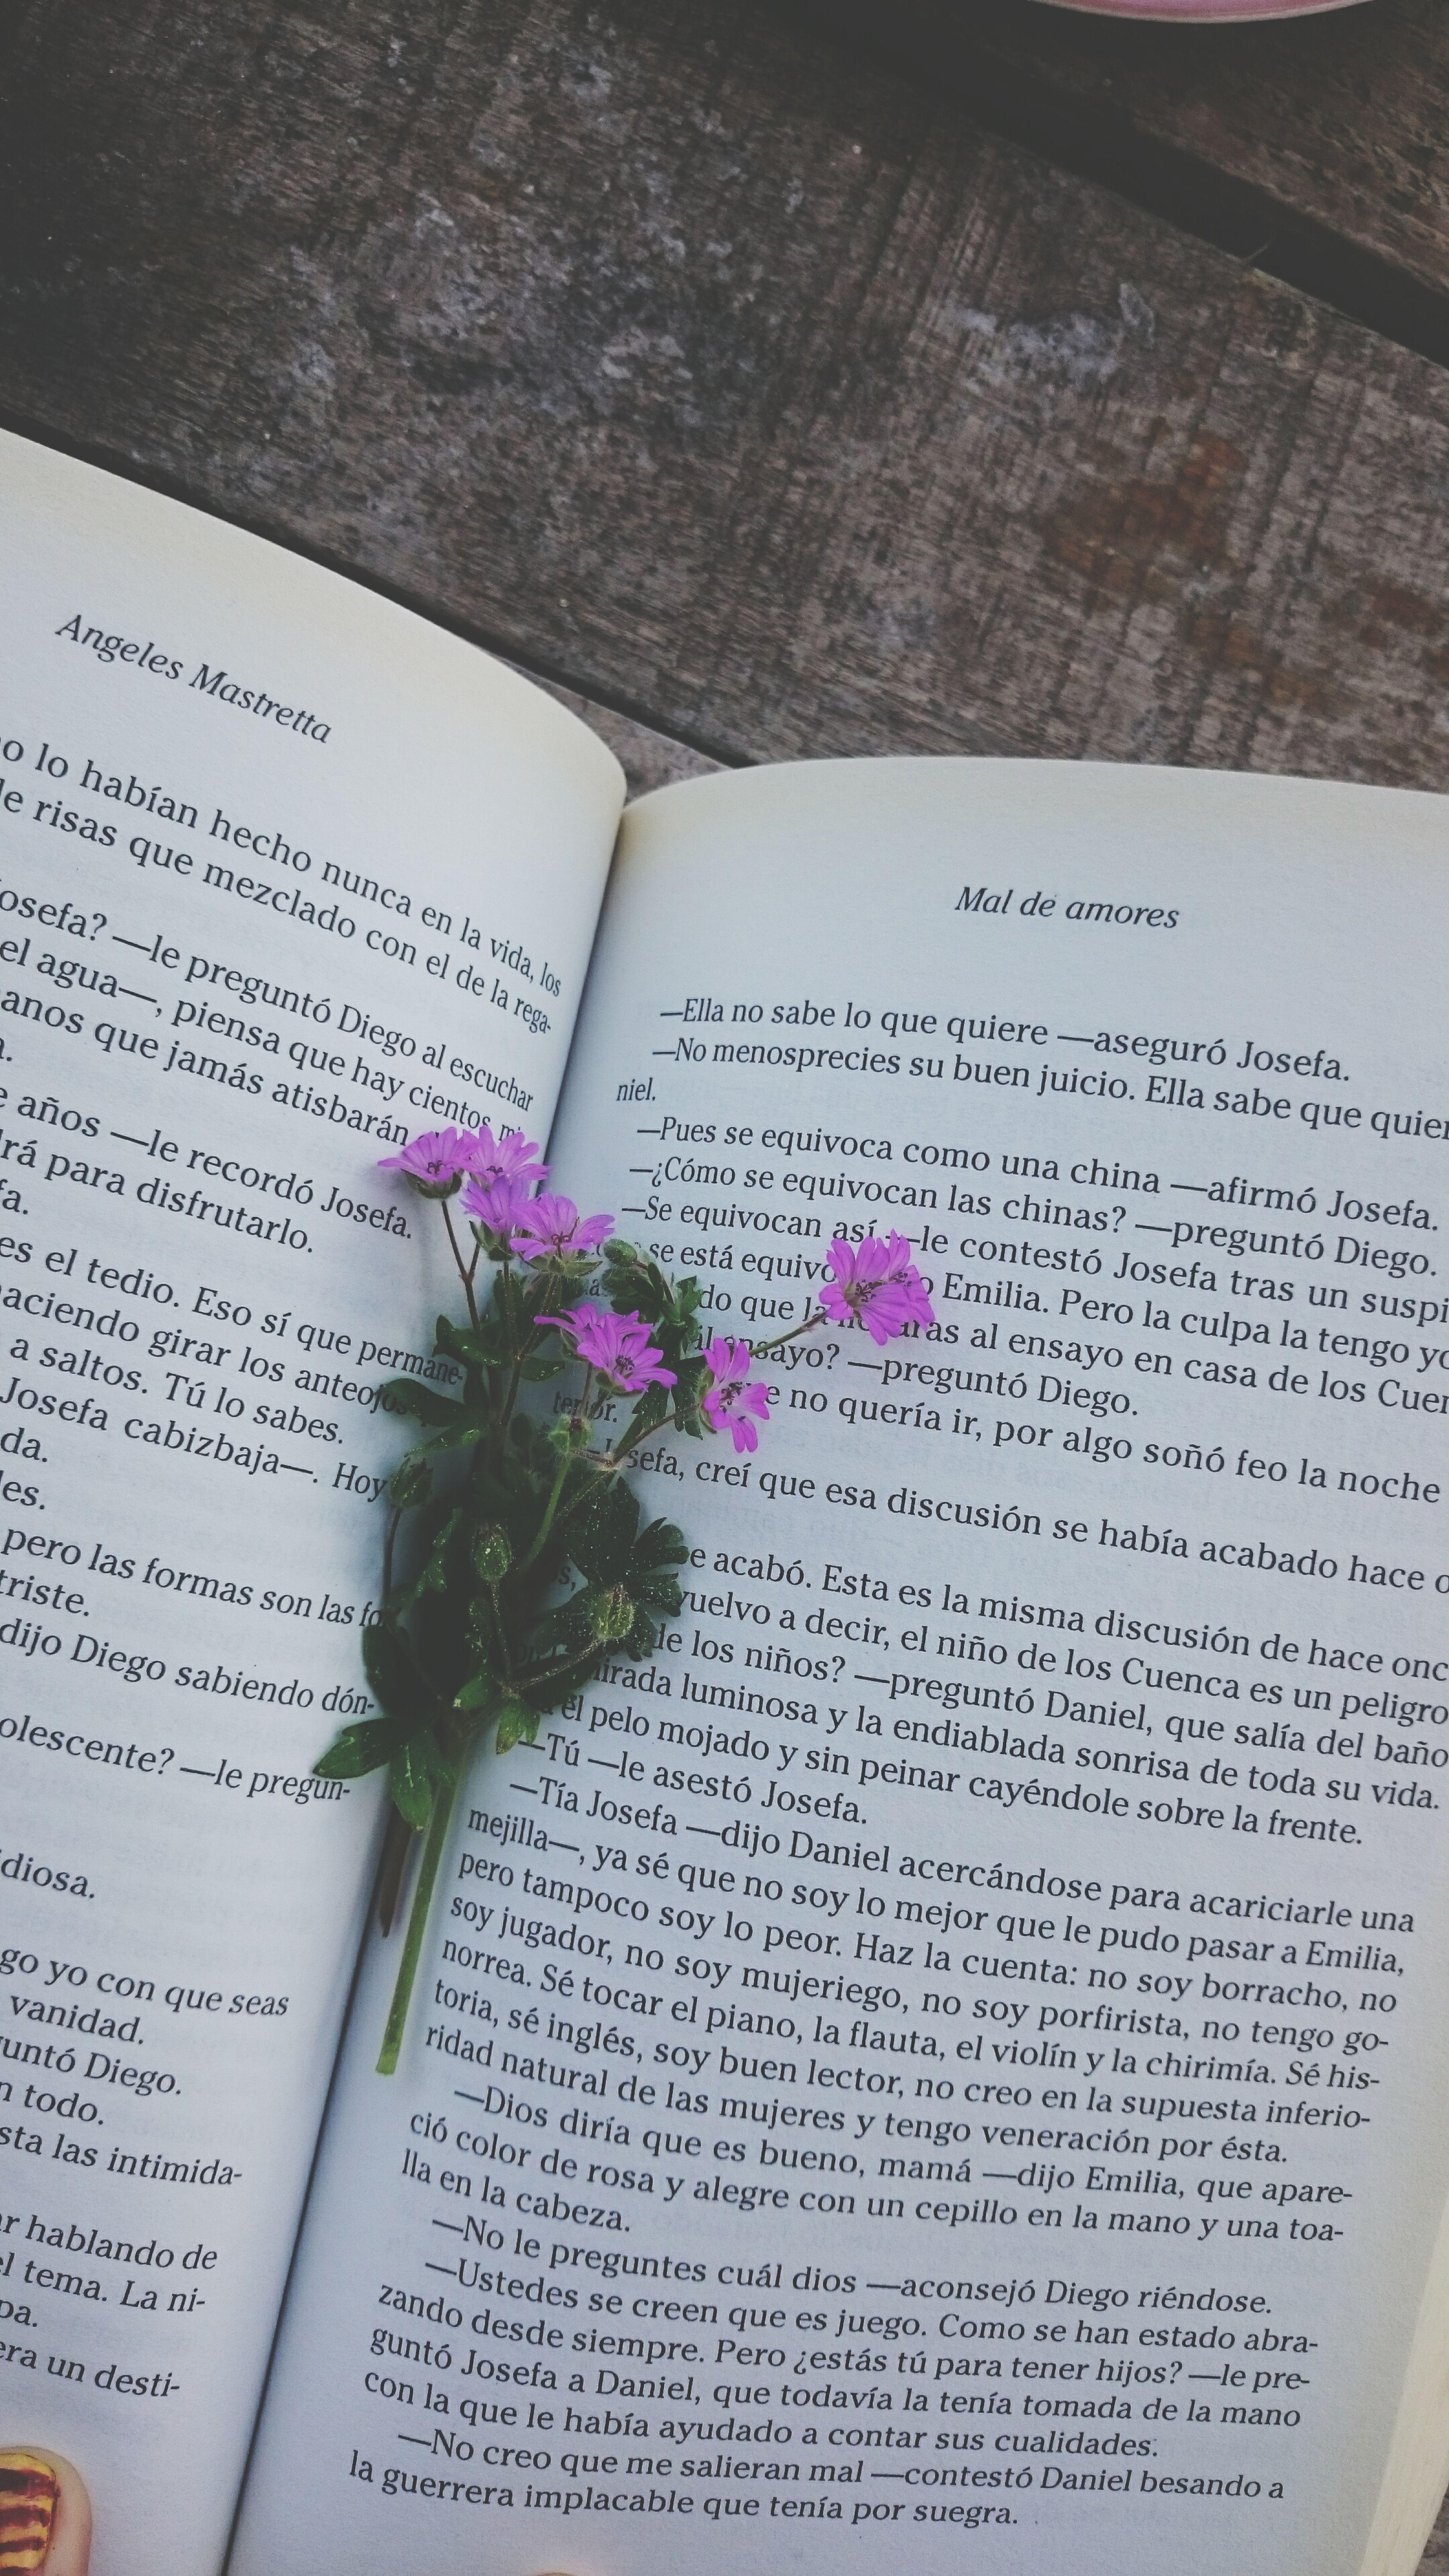 Welcomespring Spring Flowers Book Niceday Lovesprig Sun Chilling